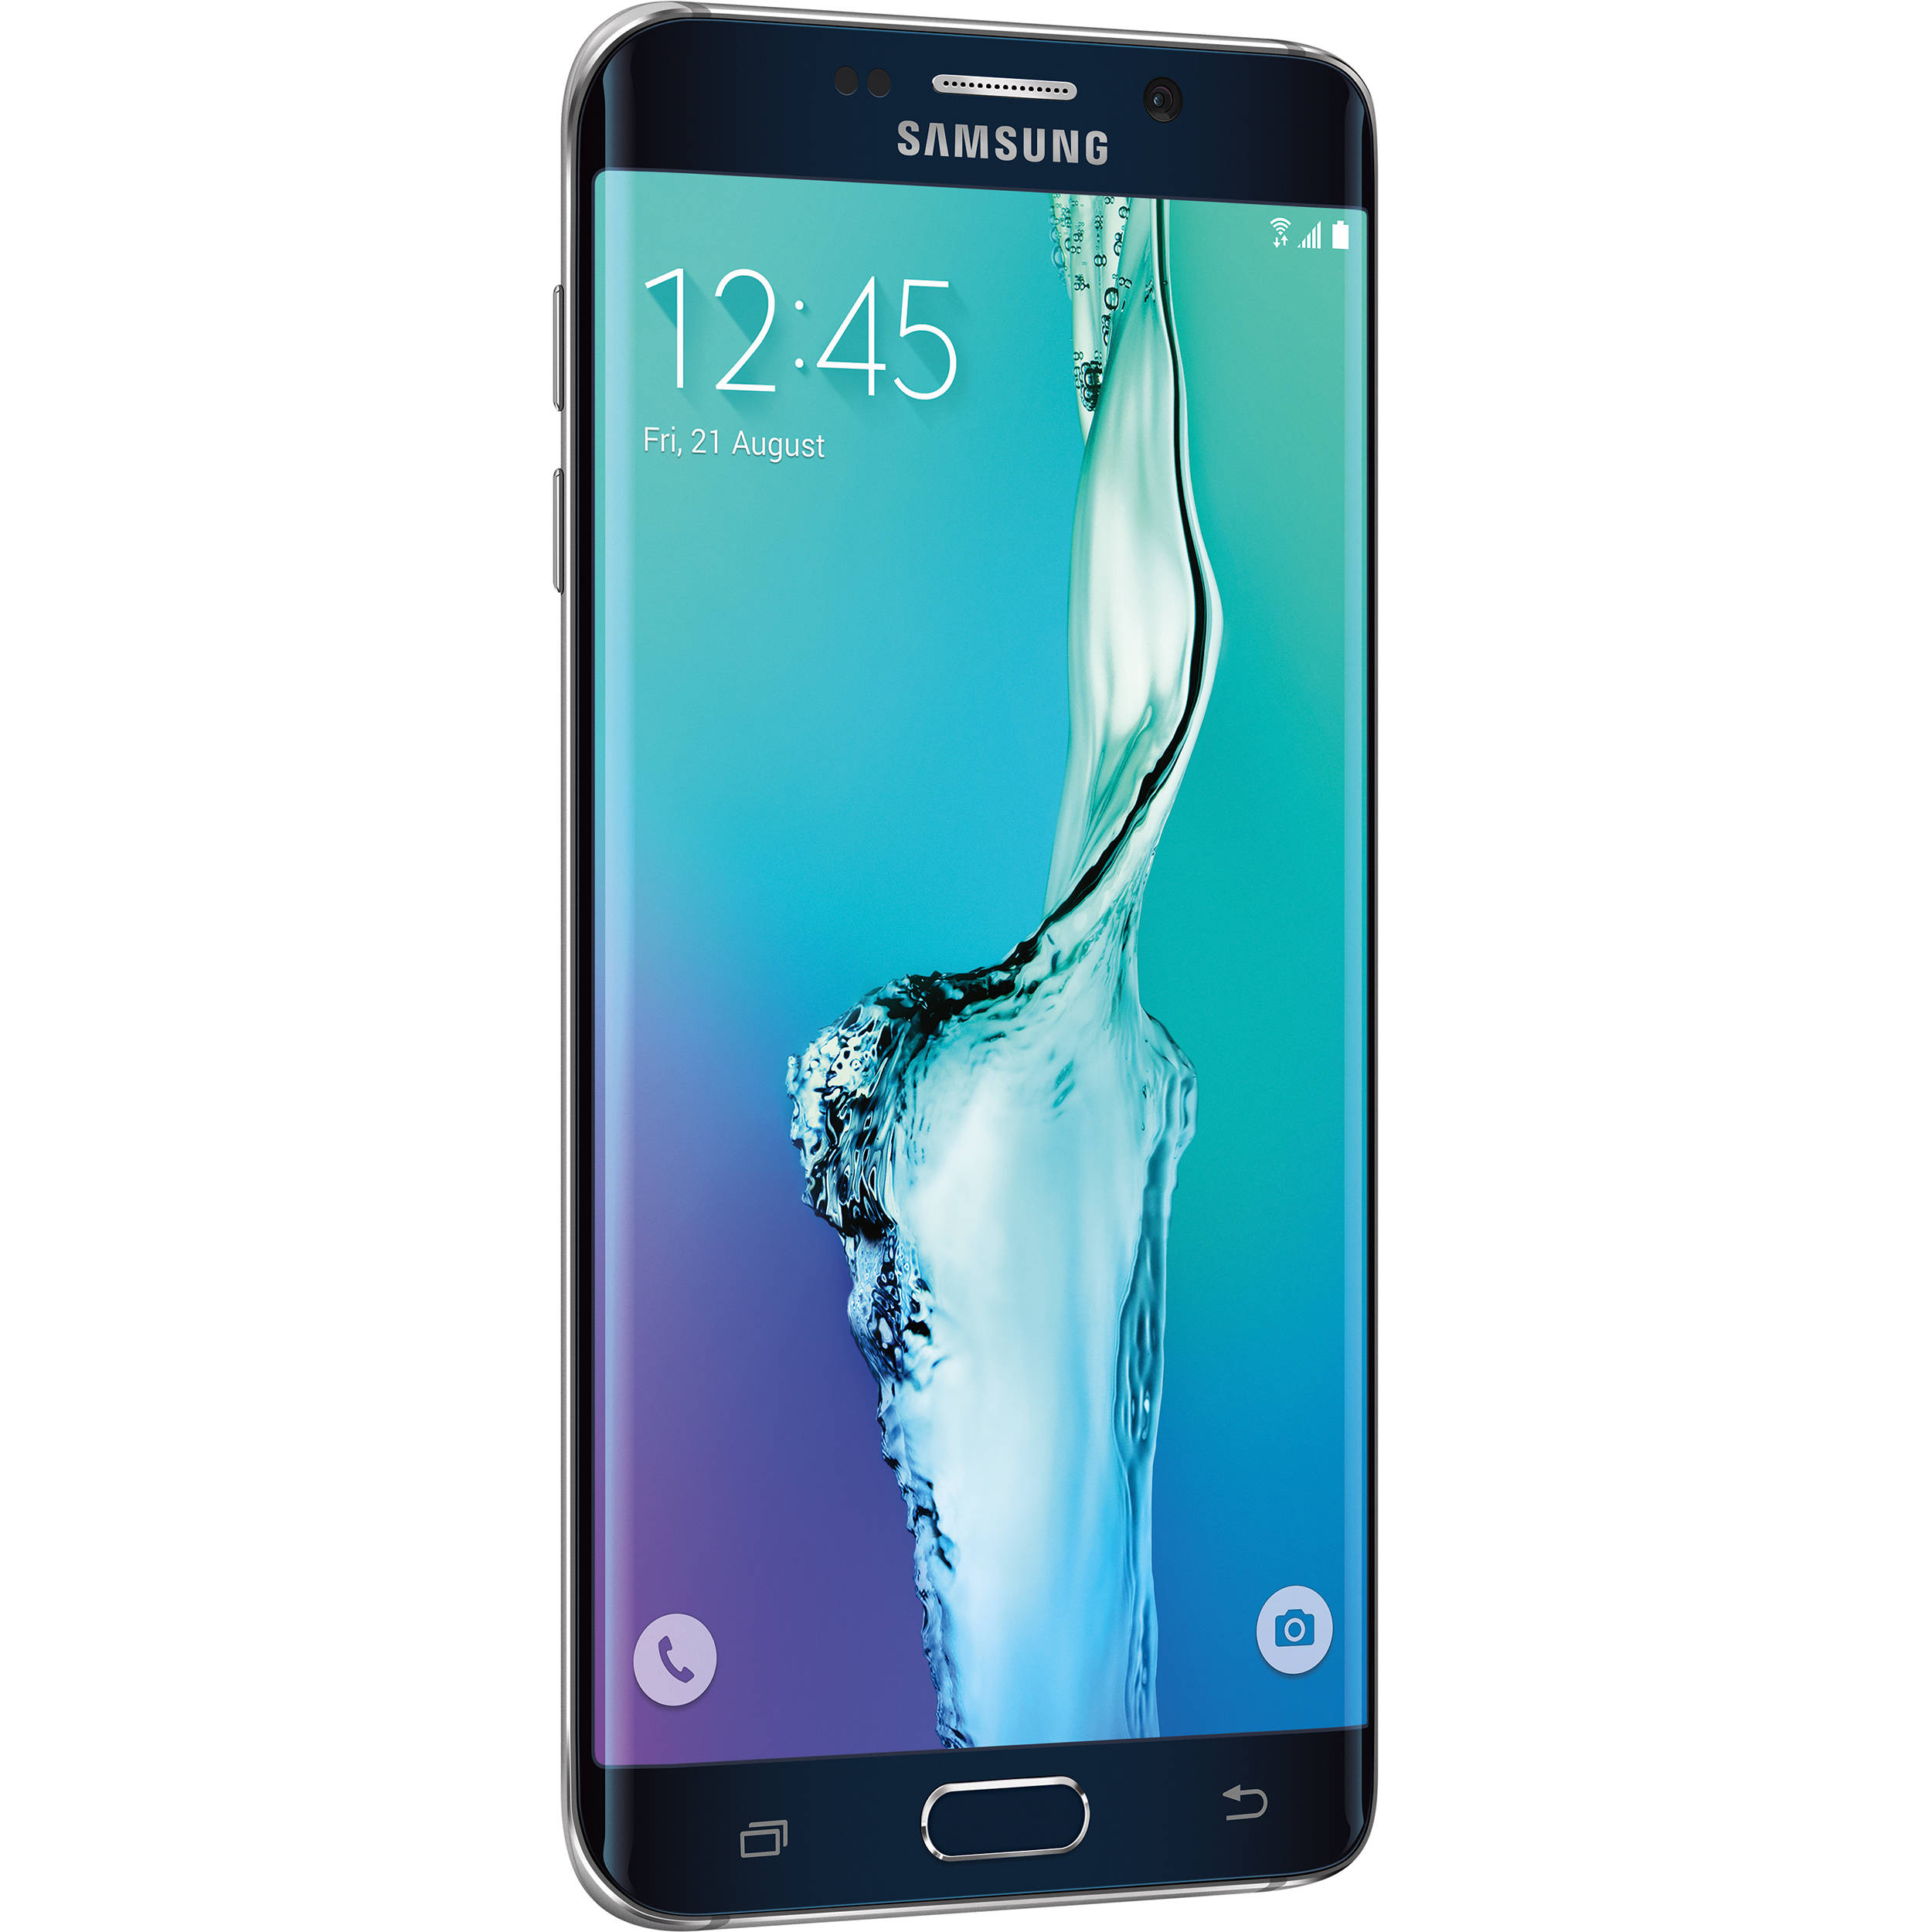 Samsung Galaxy S6 edge+ SM-G928V 32GB Smartphone (Verizon, Black)